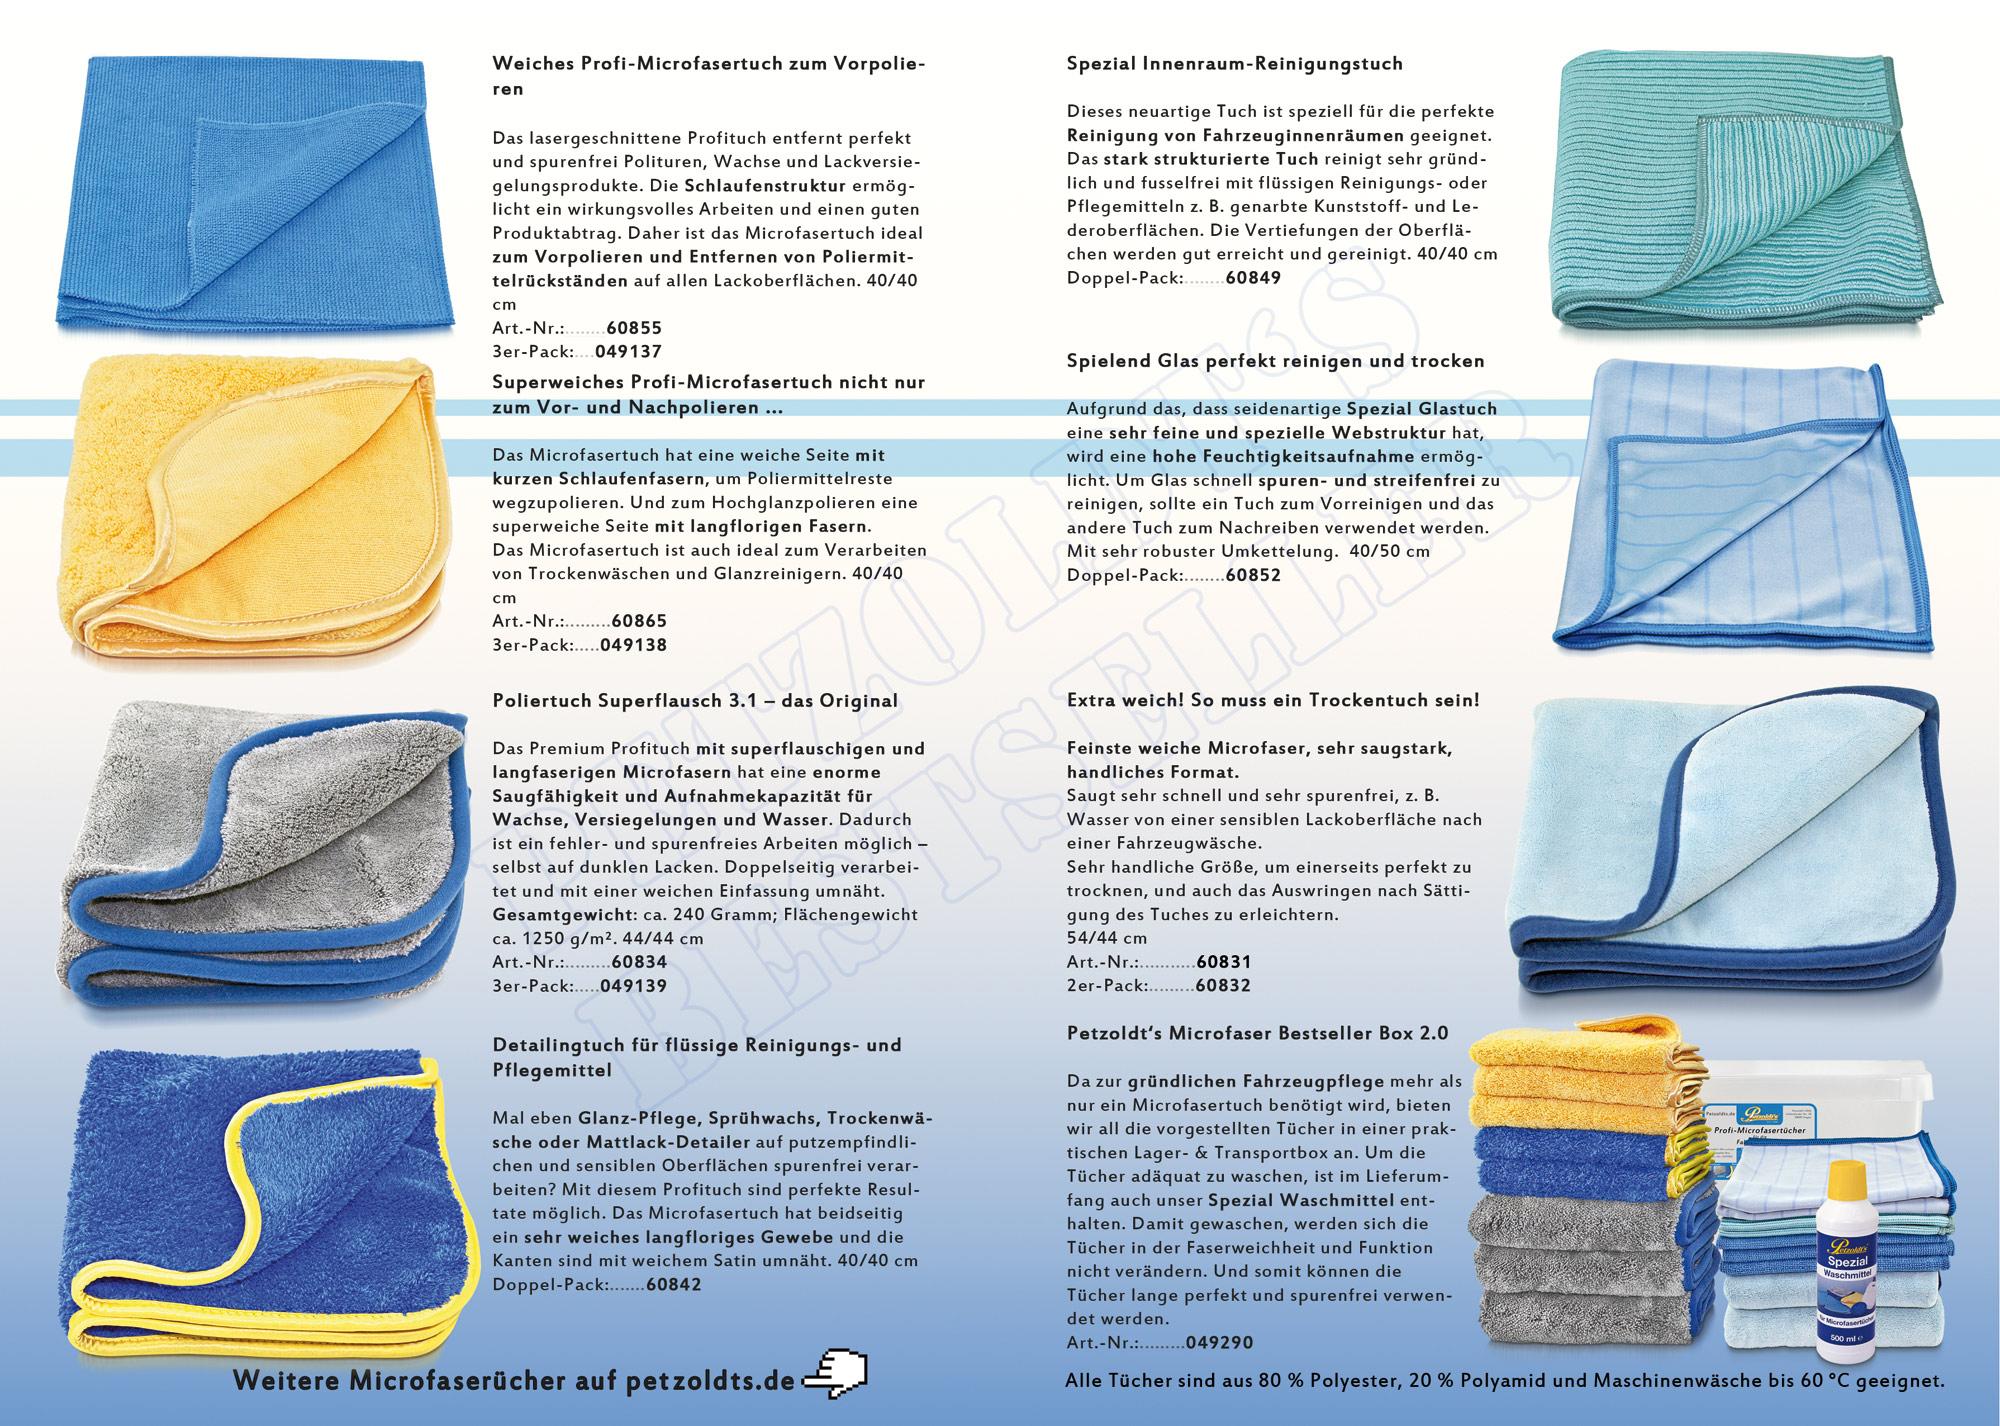 2er Microfaser Spezial Glastücher Set, Petzoldts